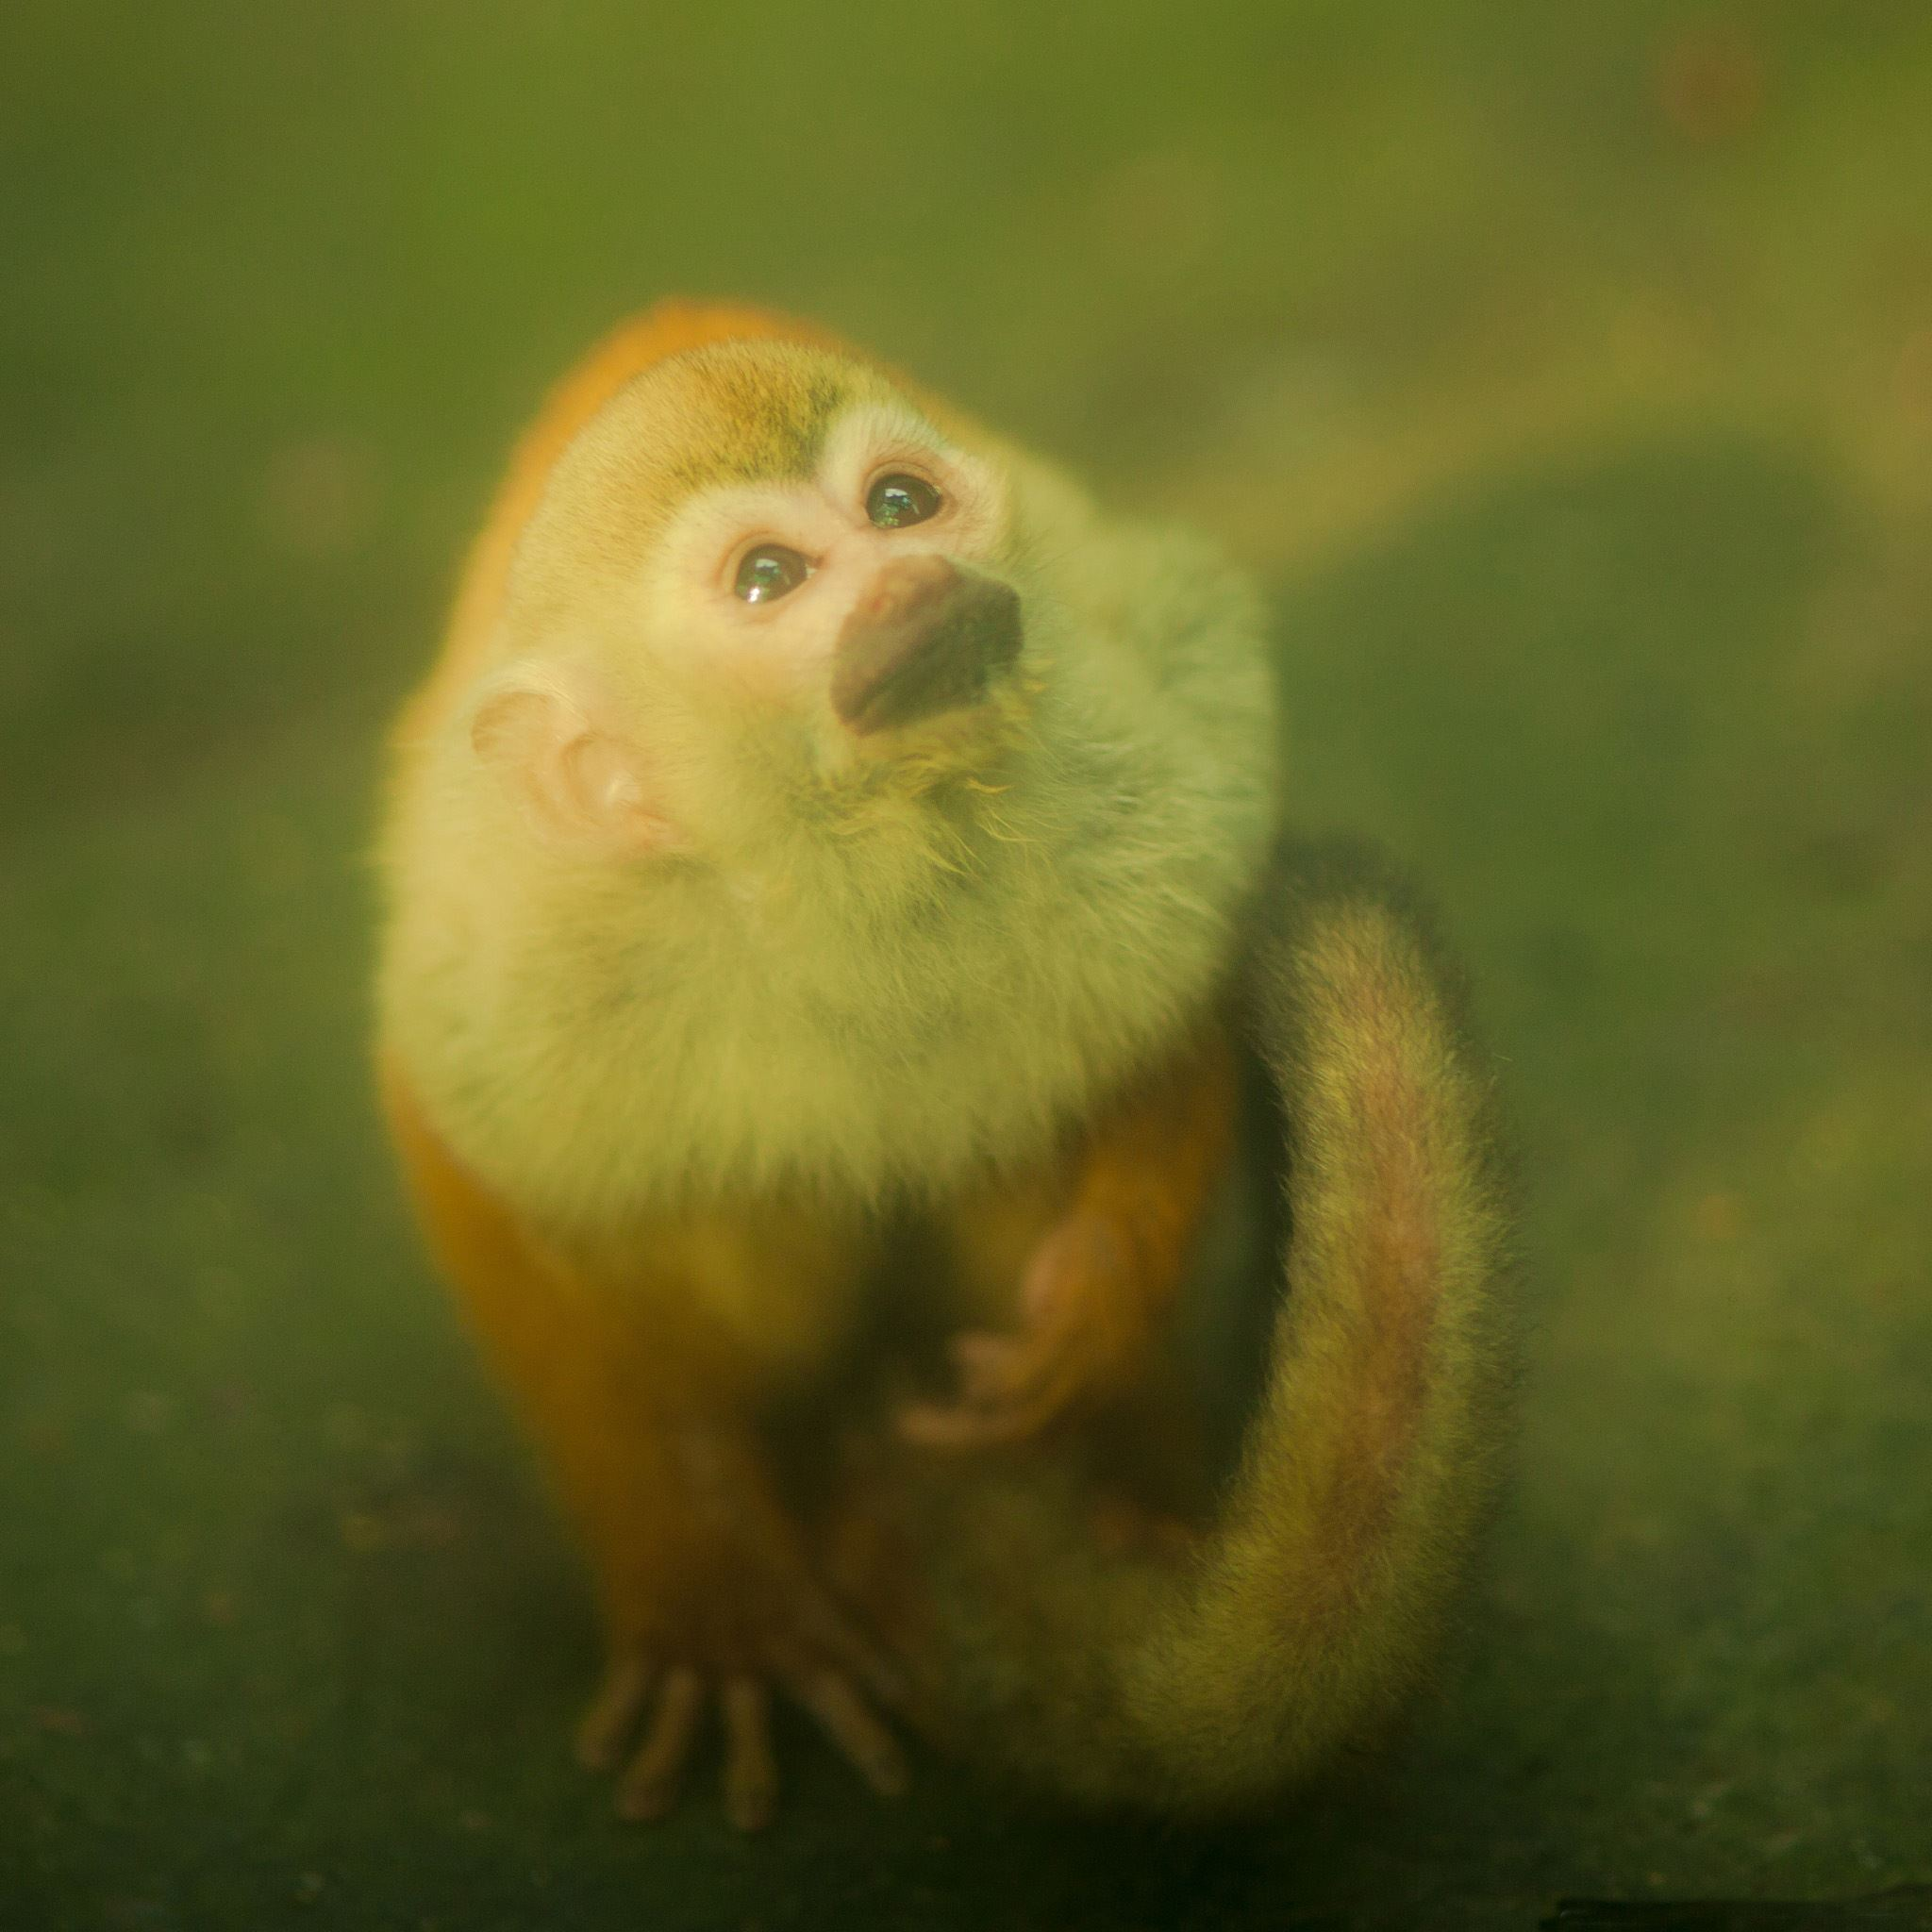 Monkey iPad Air wallpaper